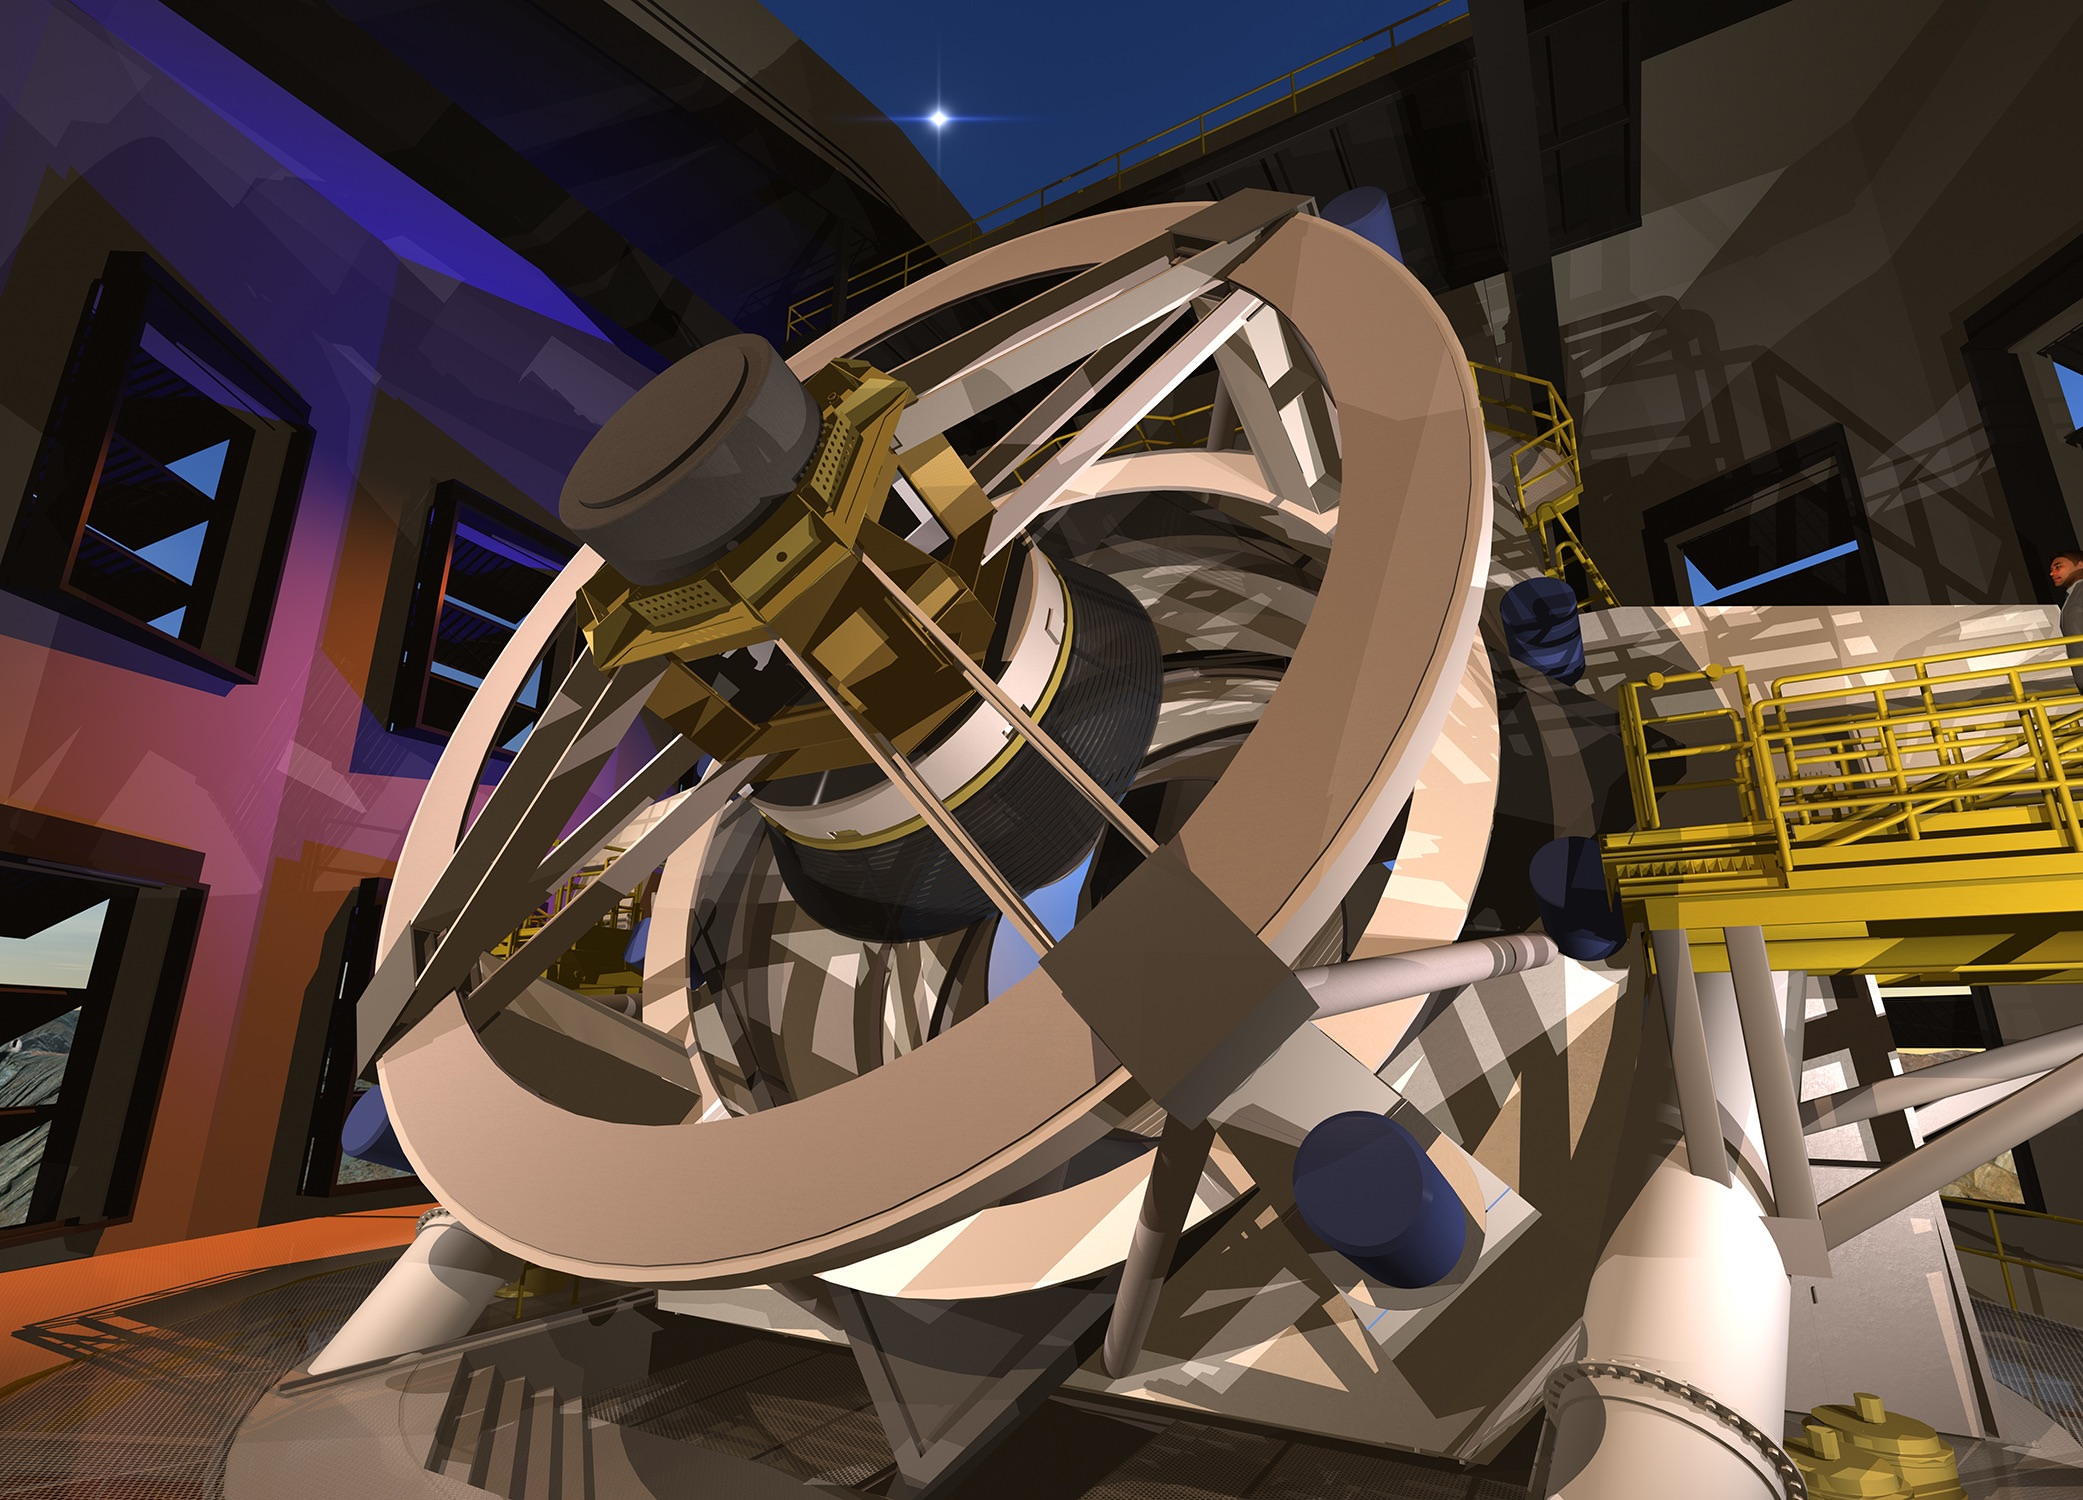 DSC-FT1119 07 Large Synoptic Survey Telescope rendering - interior